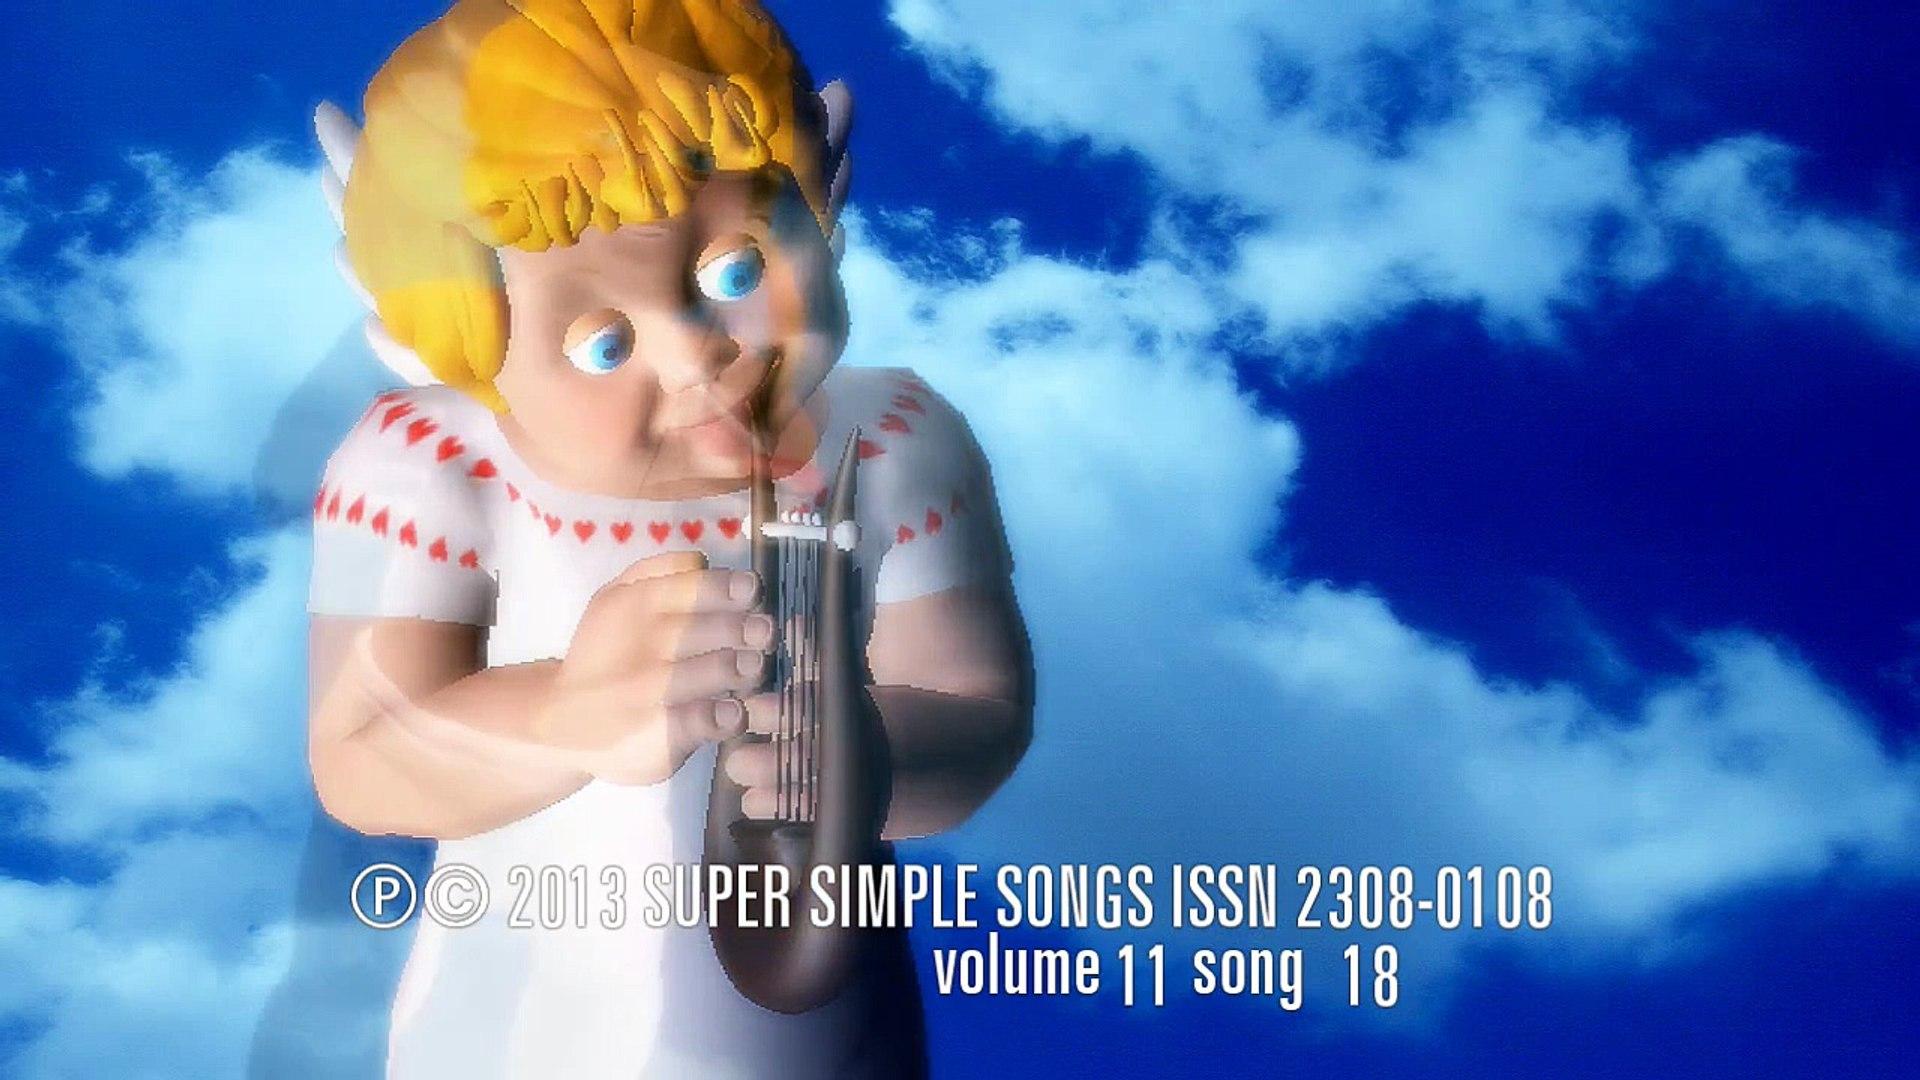 Super simple love songs and poetry of love #18-2-11 - Ютуб - Песни о любви